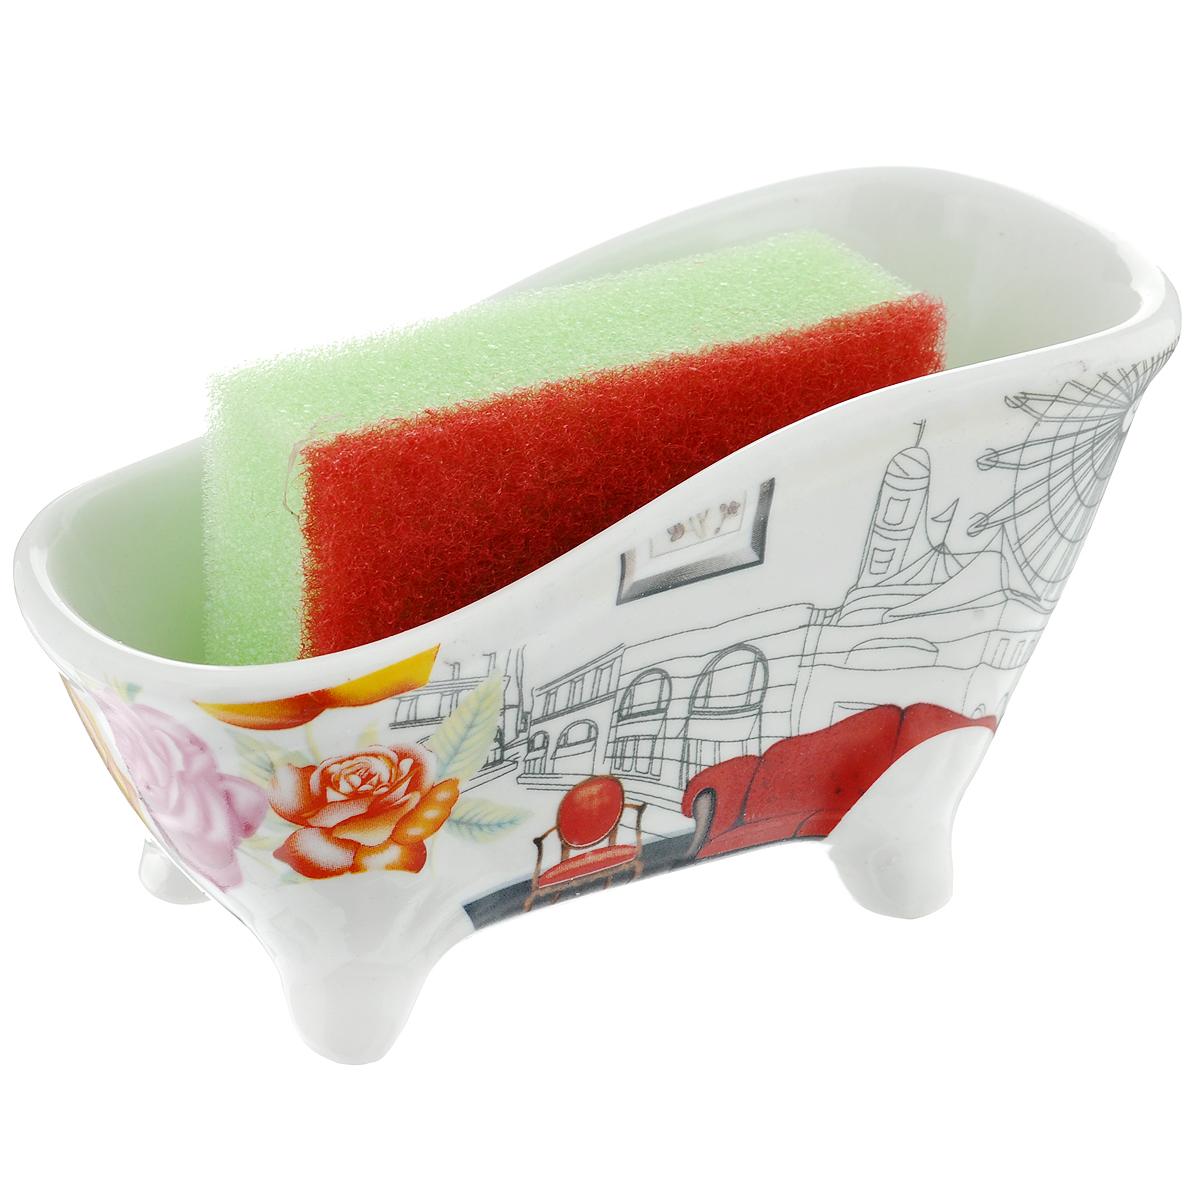 Набор для мытья посуды Besko Амалия, 2 предмета. 532-154532-154